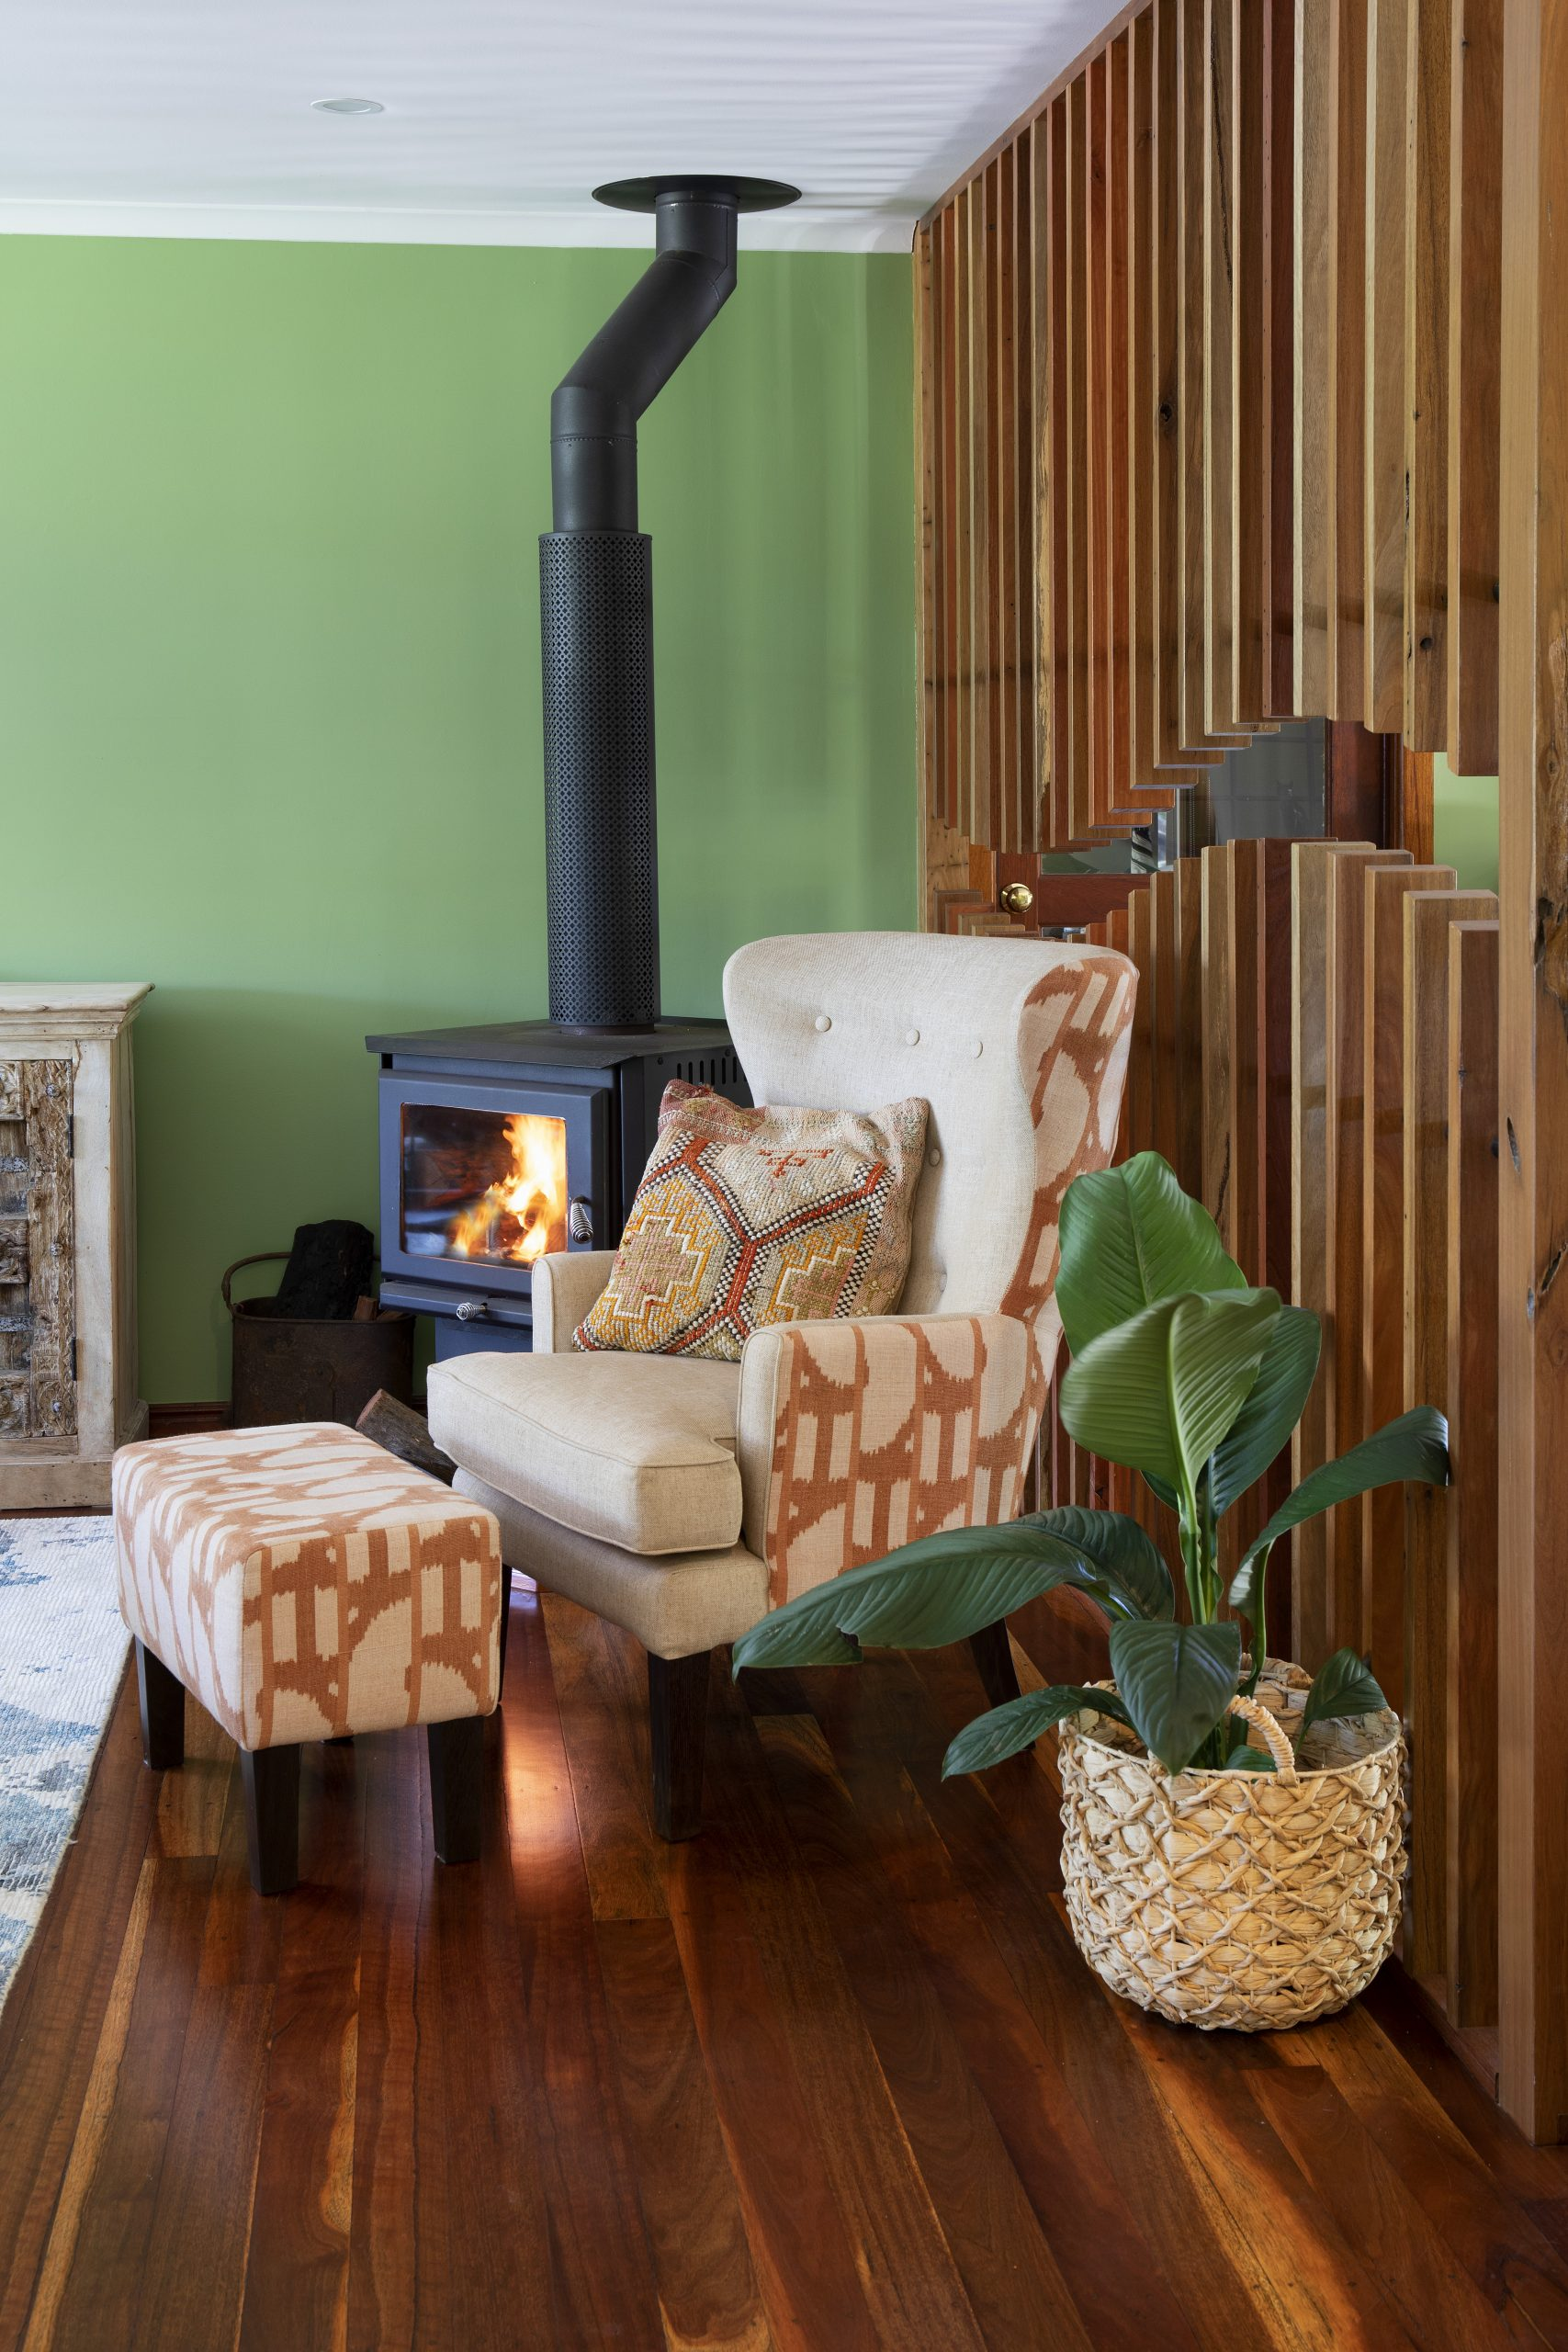 https://www.ivyandfinch.com.au/wp-content/uploads/2016/05/Interior-Design-Brookfield-Armchair-scaled.jpg